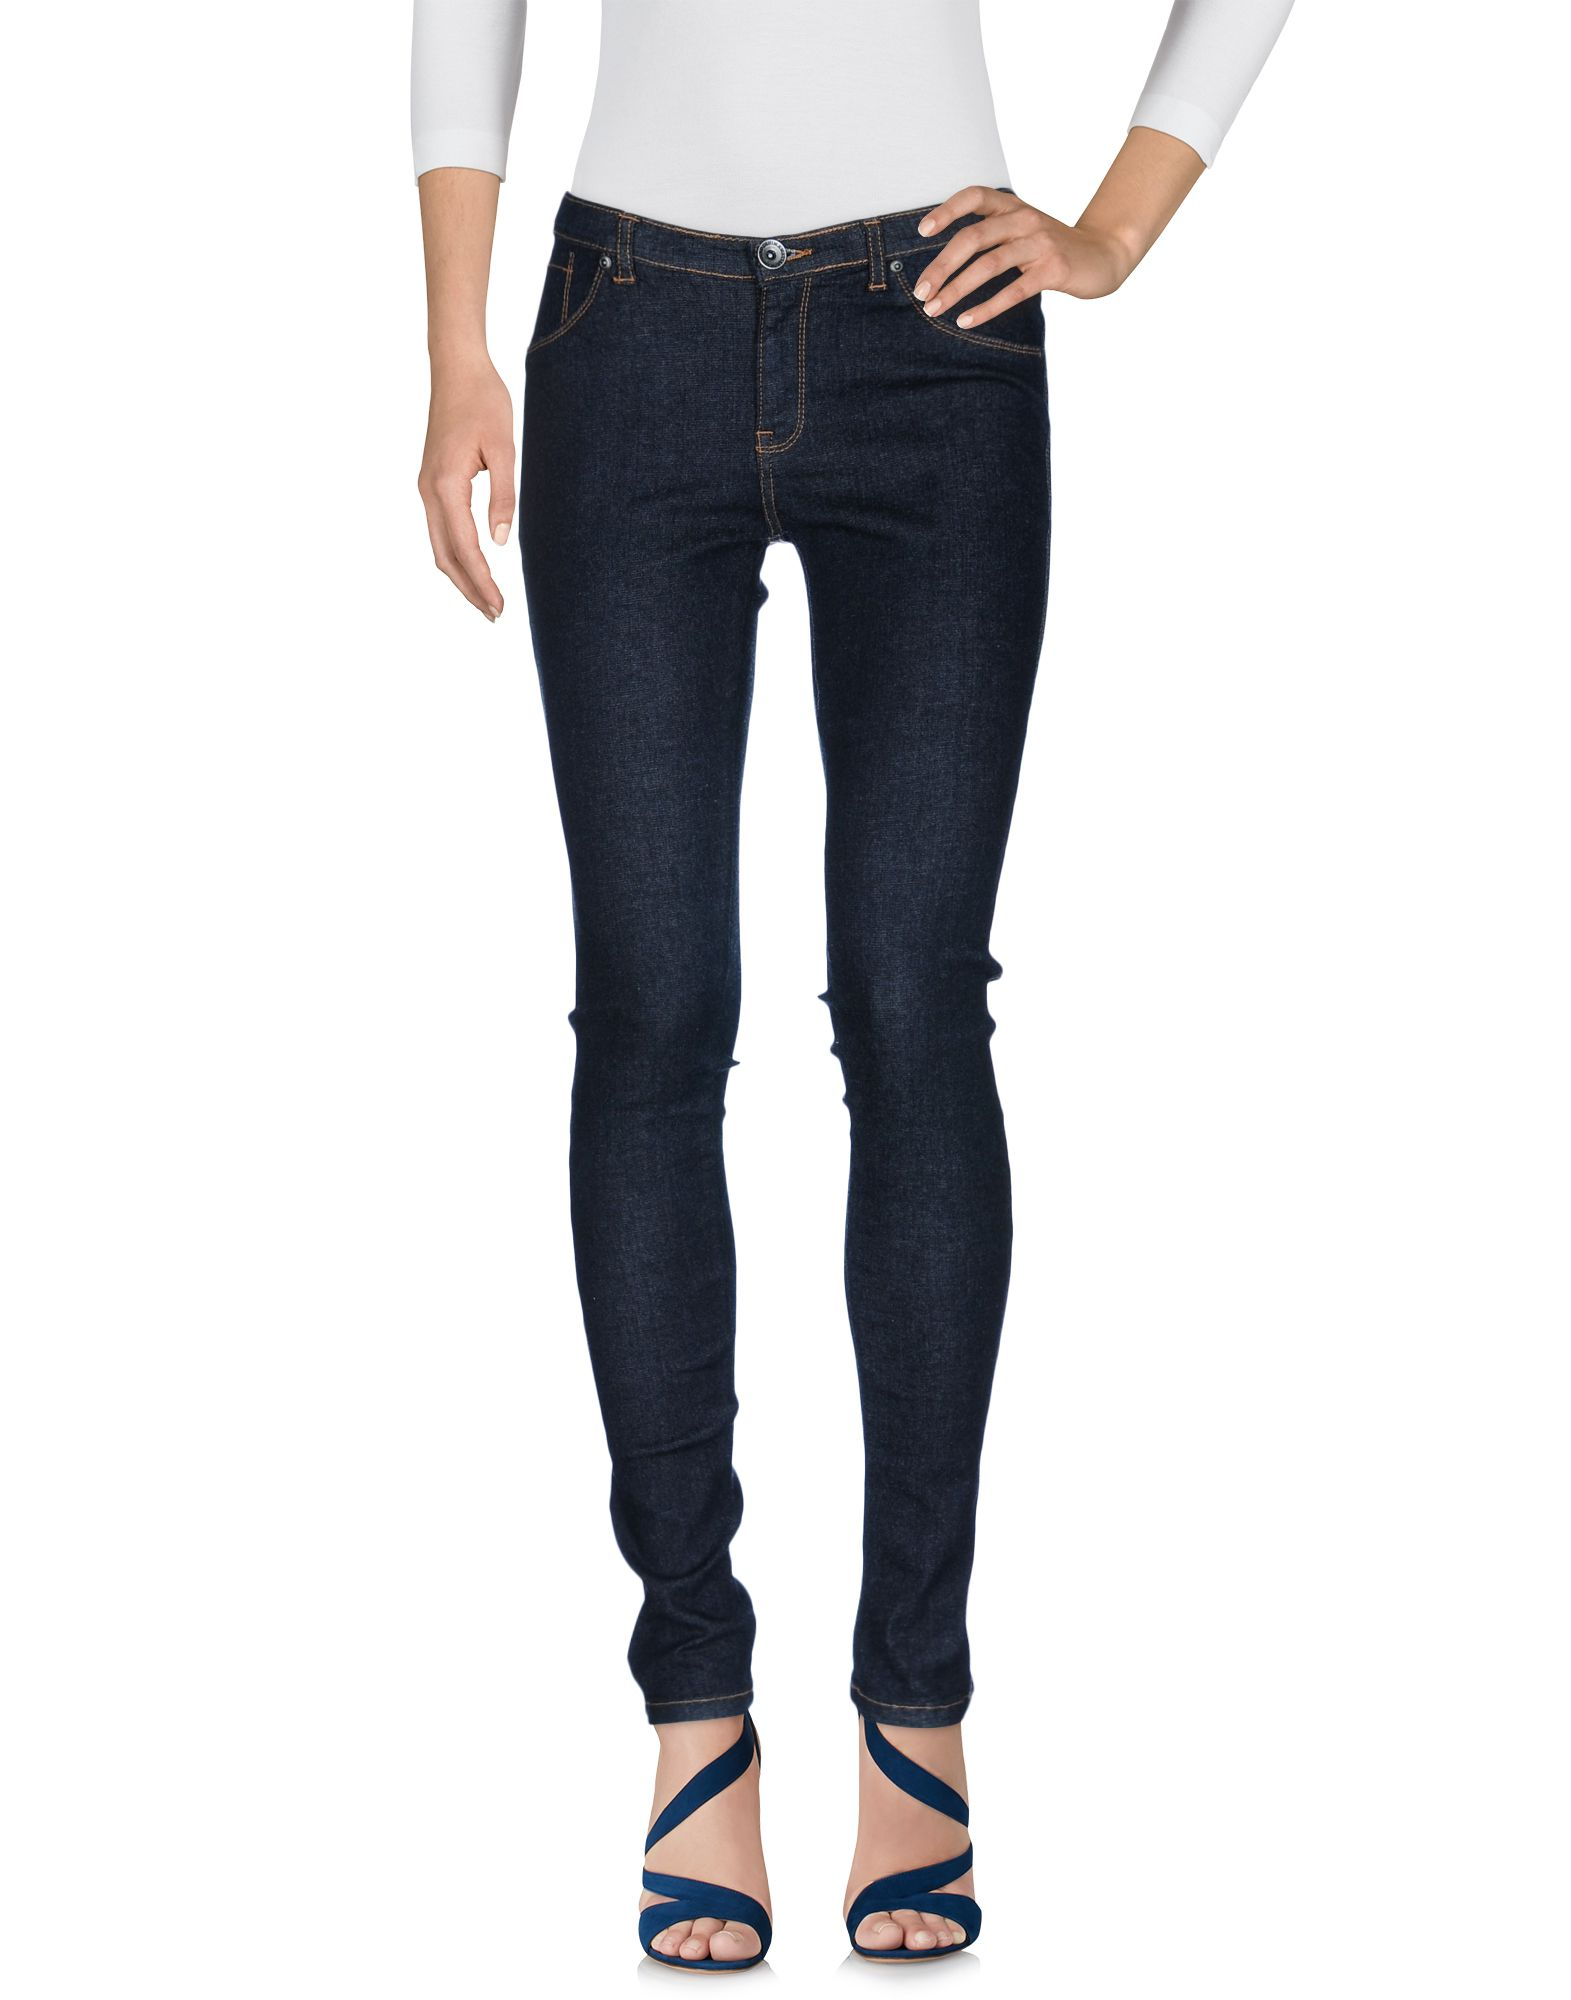 DR. DENIM JEANSMAKERS Джинсовые брюки tight denim джинсовые брюки